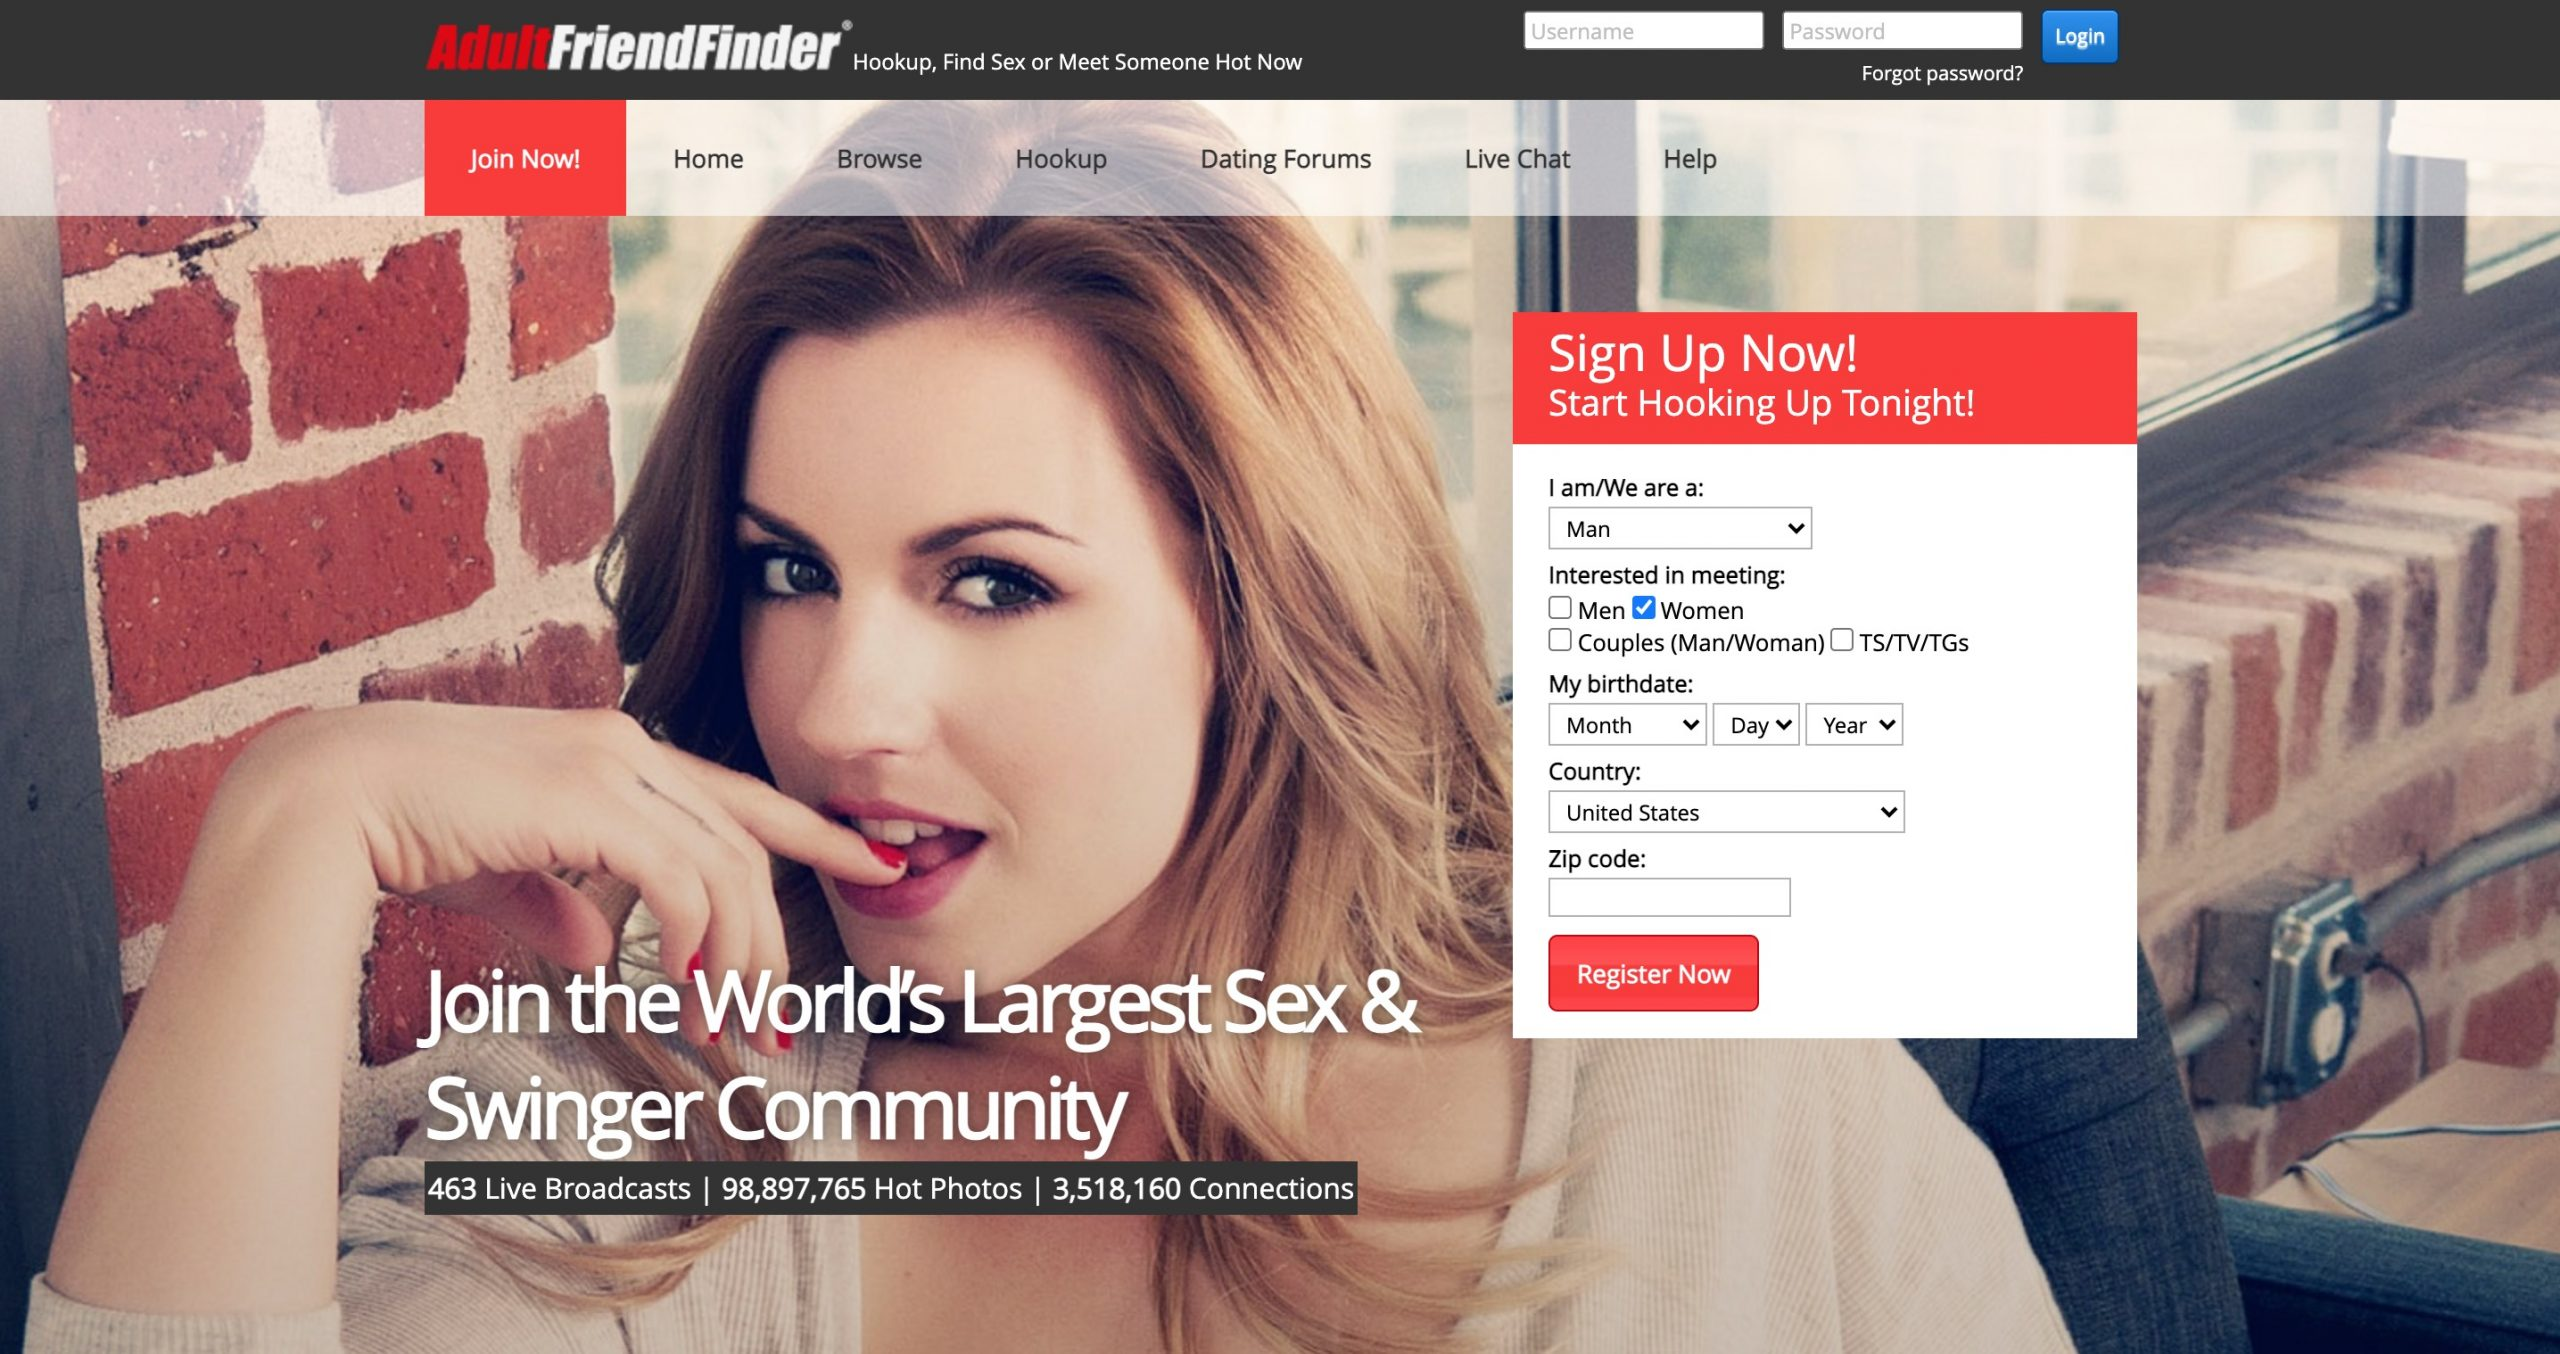 AdultFriendFinder main page